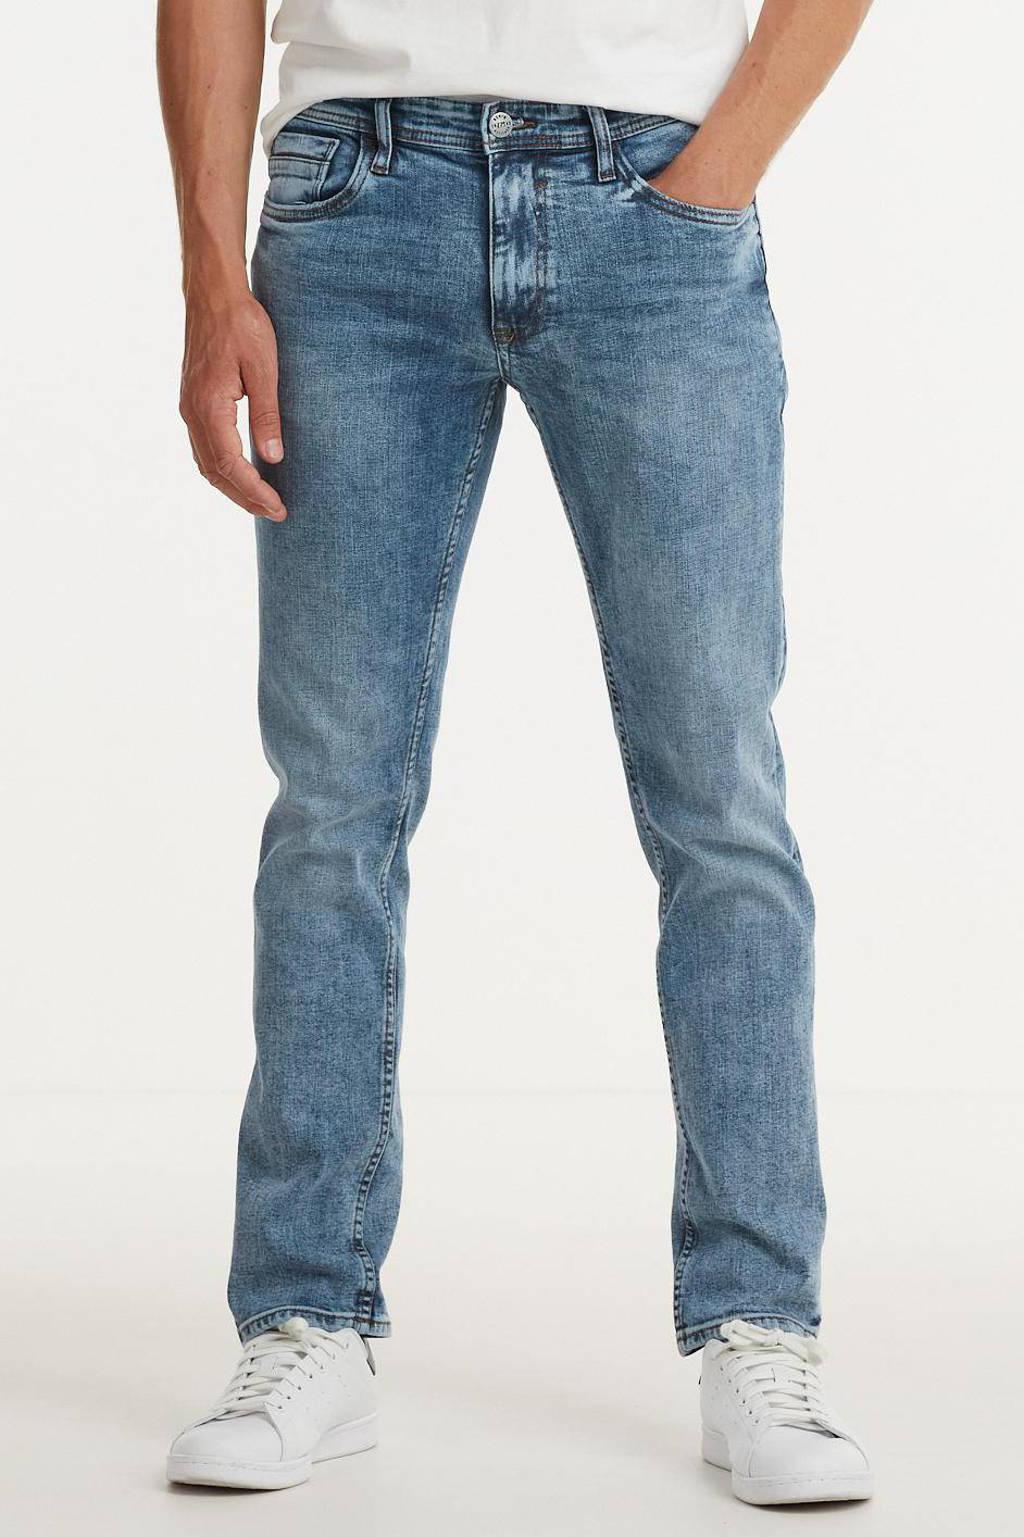 Blend slim fit jeans 200290 denim light, 200290 Denim Light